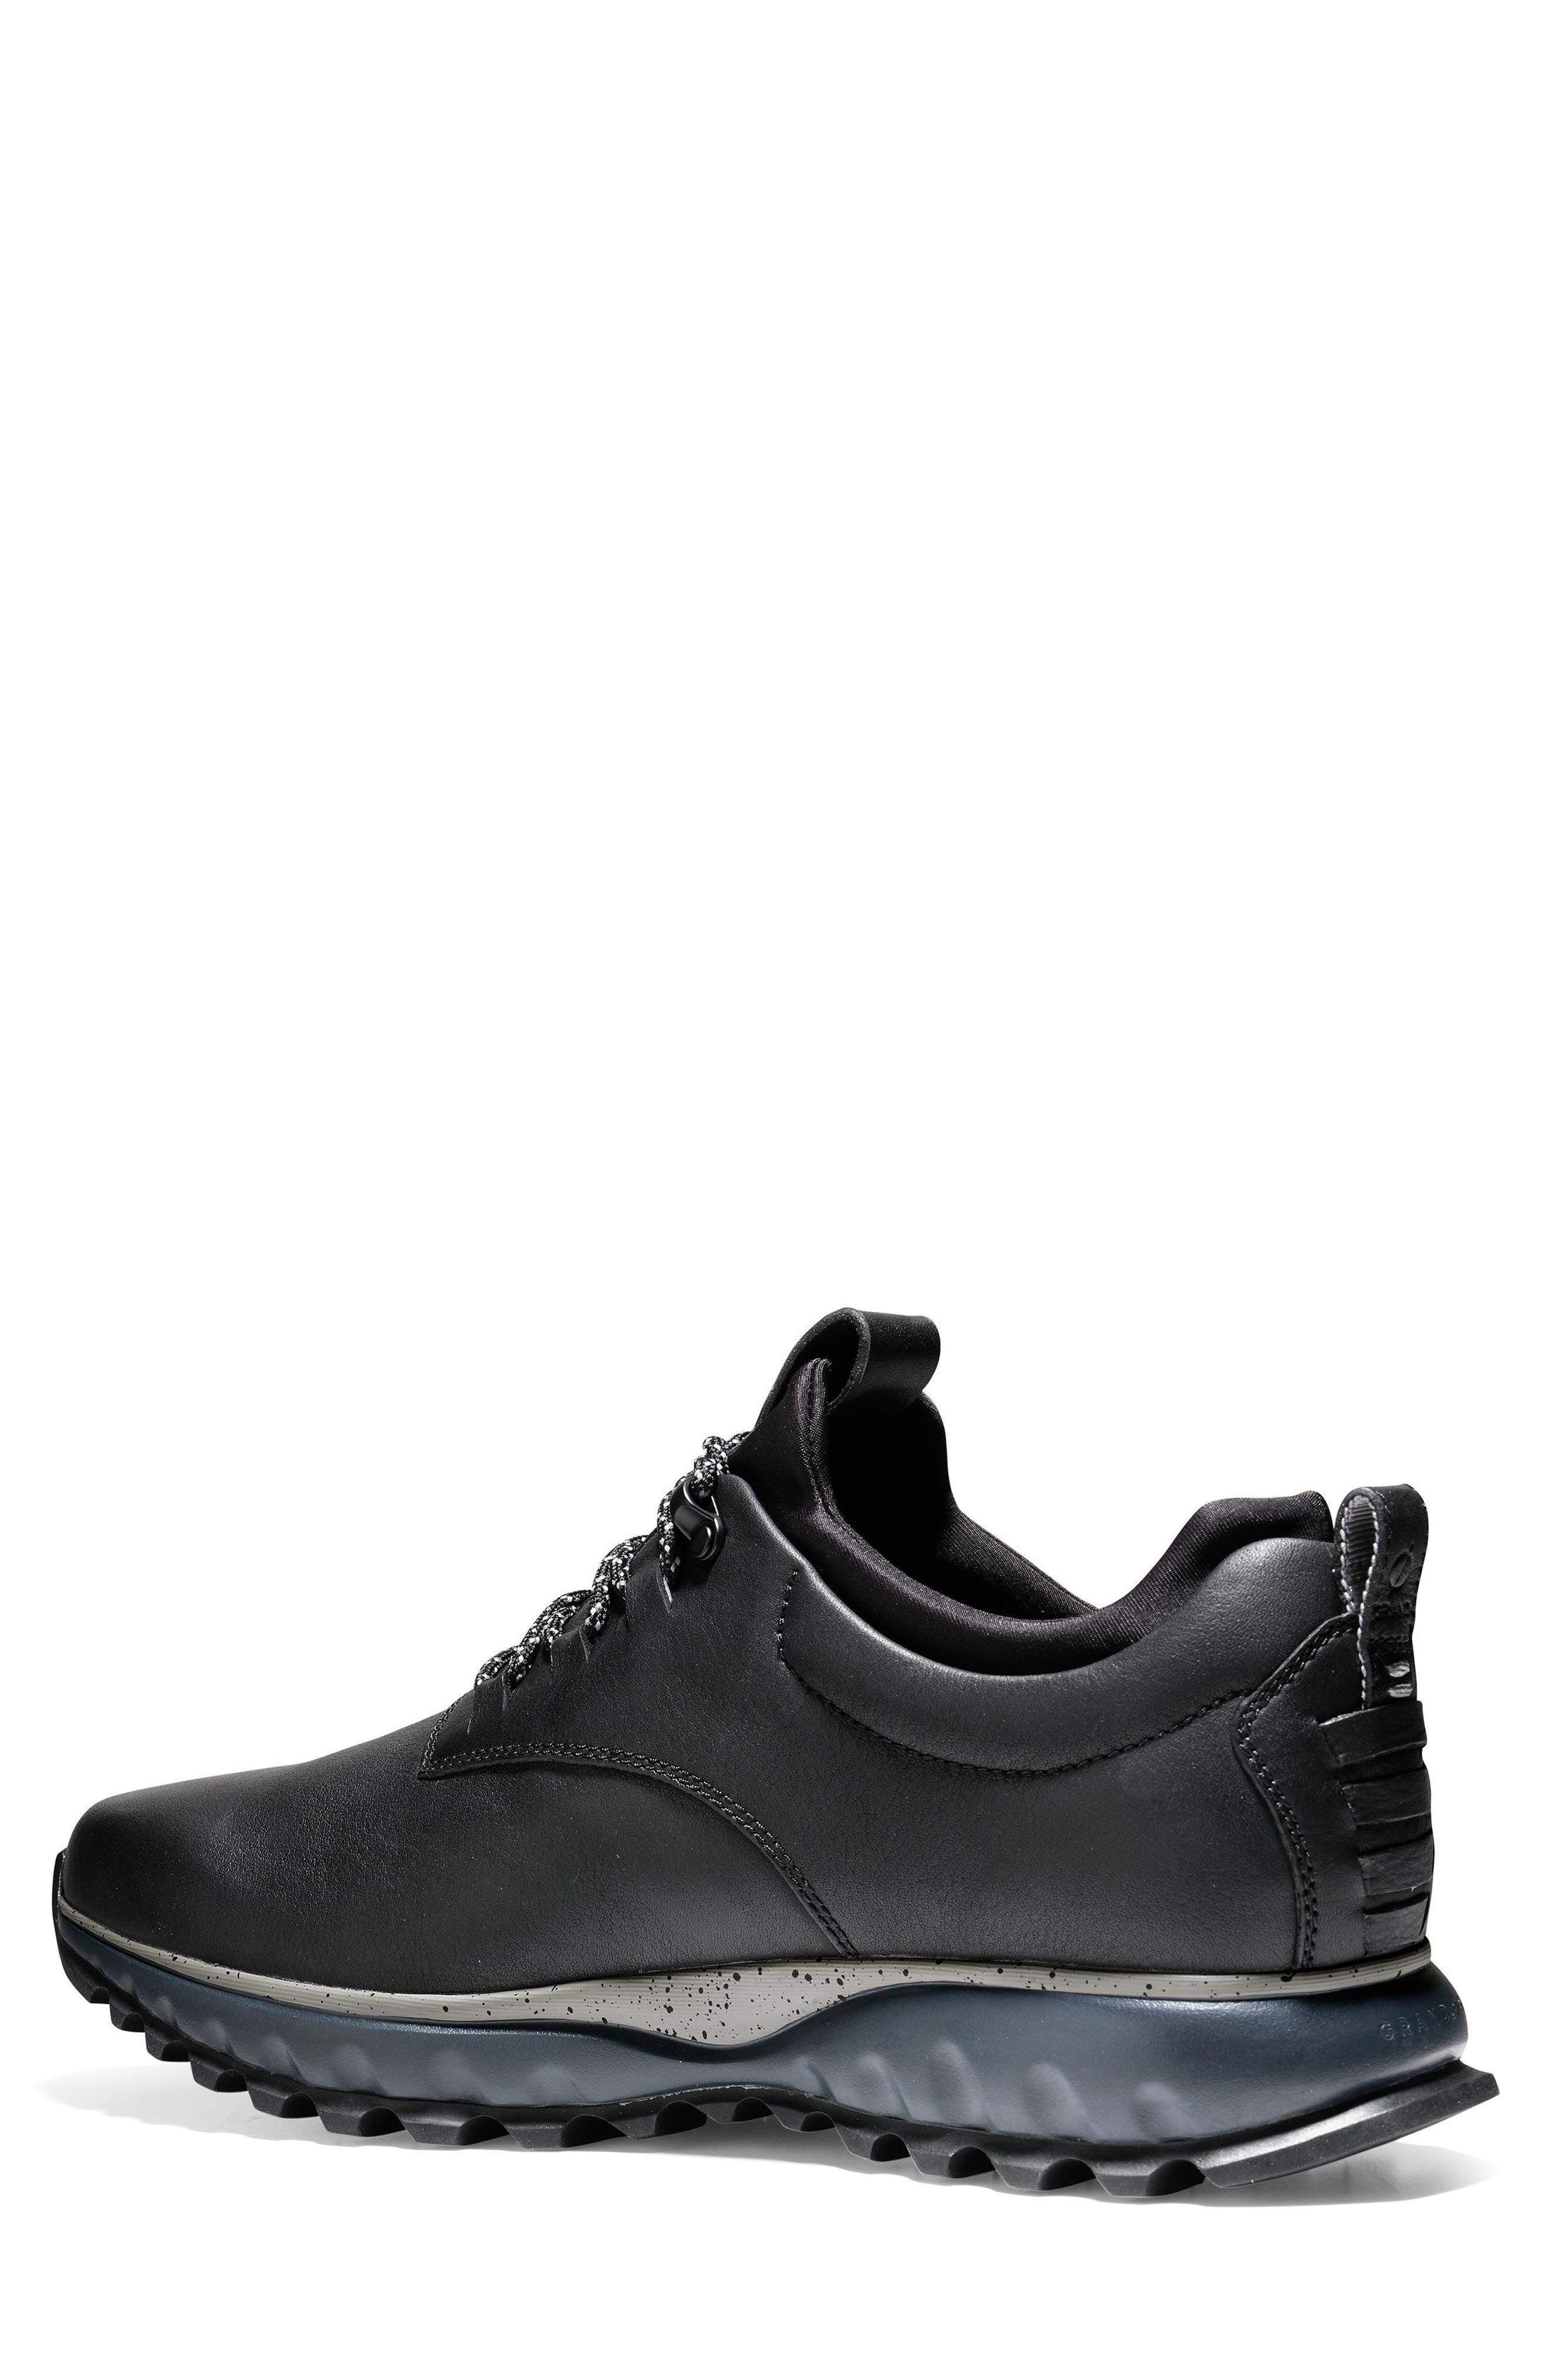 GrandExpløre All Terrain Waterproof Sneaker,                             Alternate thumbnail 2, color,                             Black/ Ironstone Leather